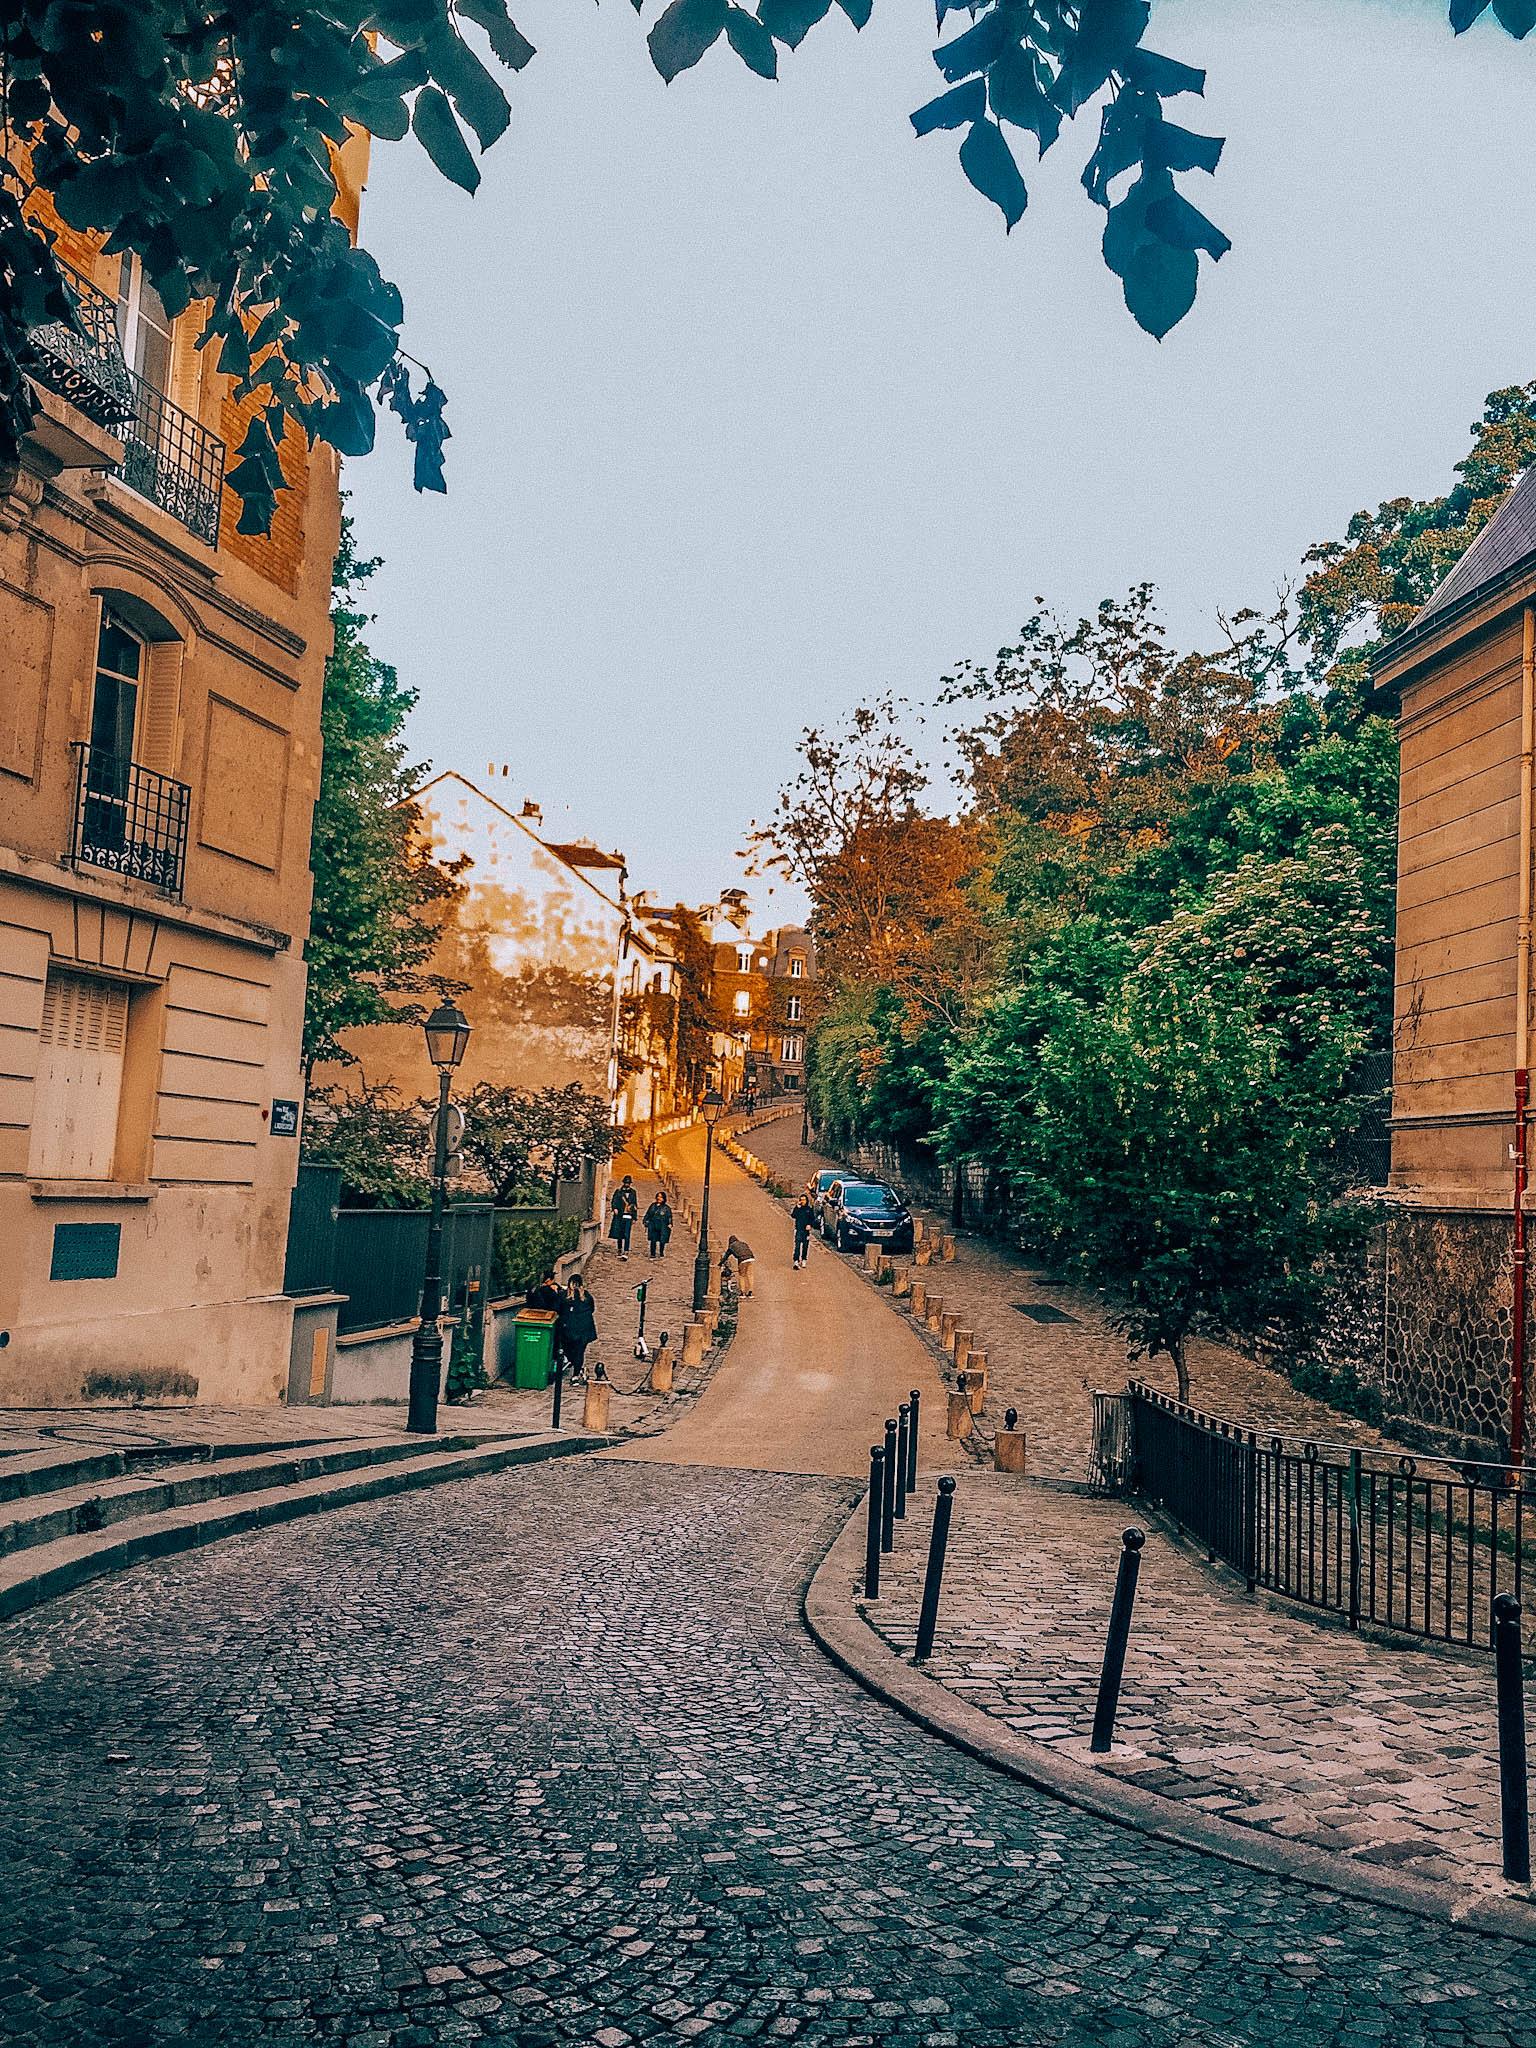 Kiedy jechać do Paryża?